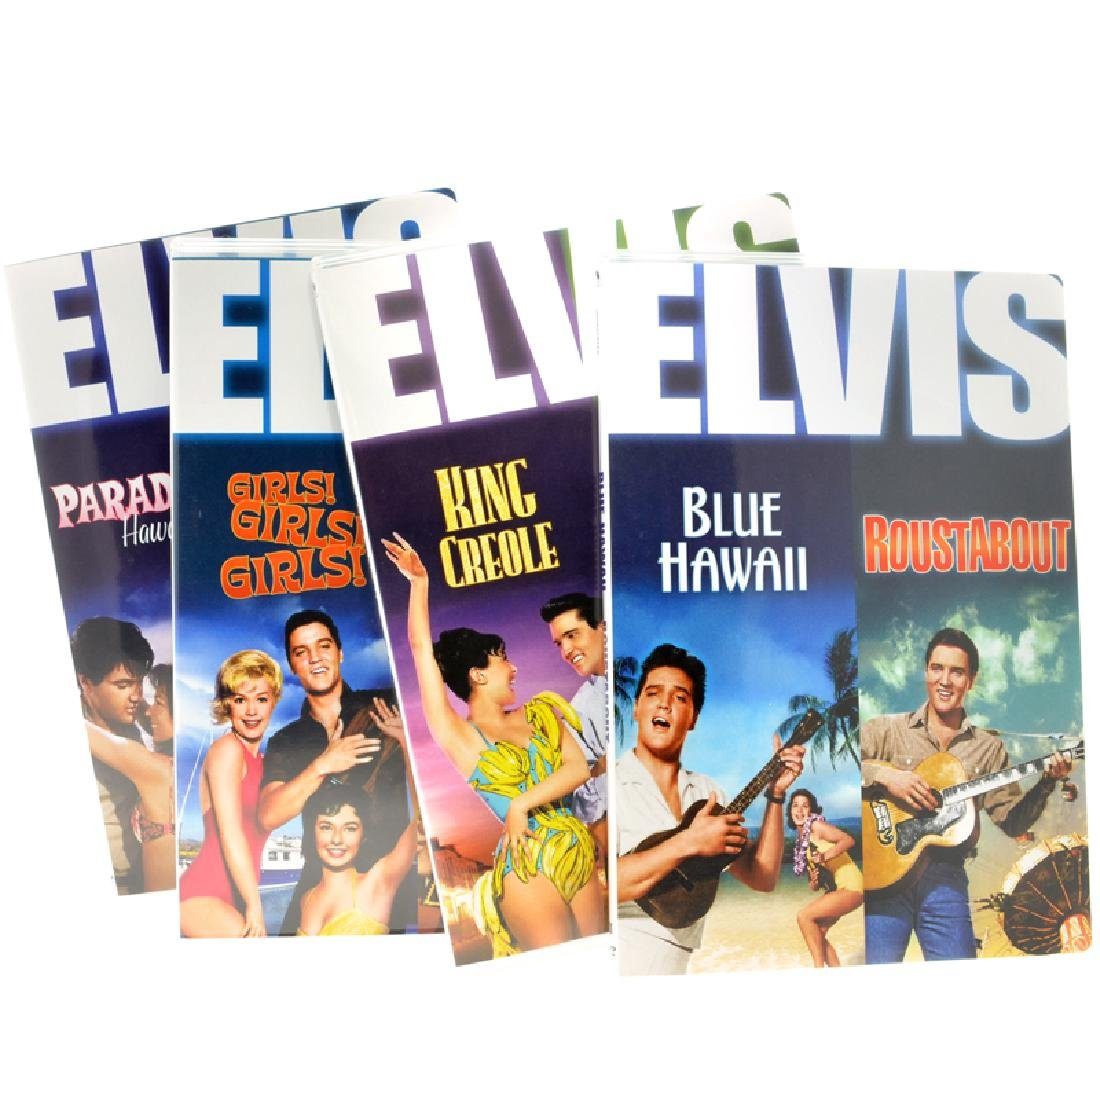 Elvis Presley Movie: Lights! Camera! Elvis! Collection, - 2